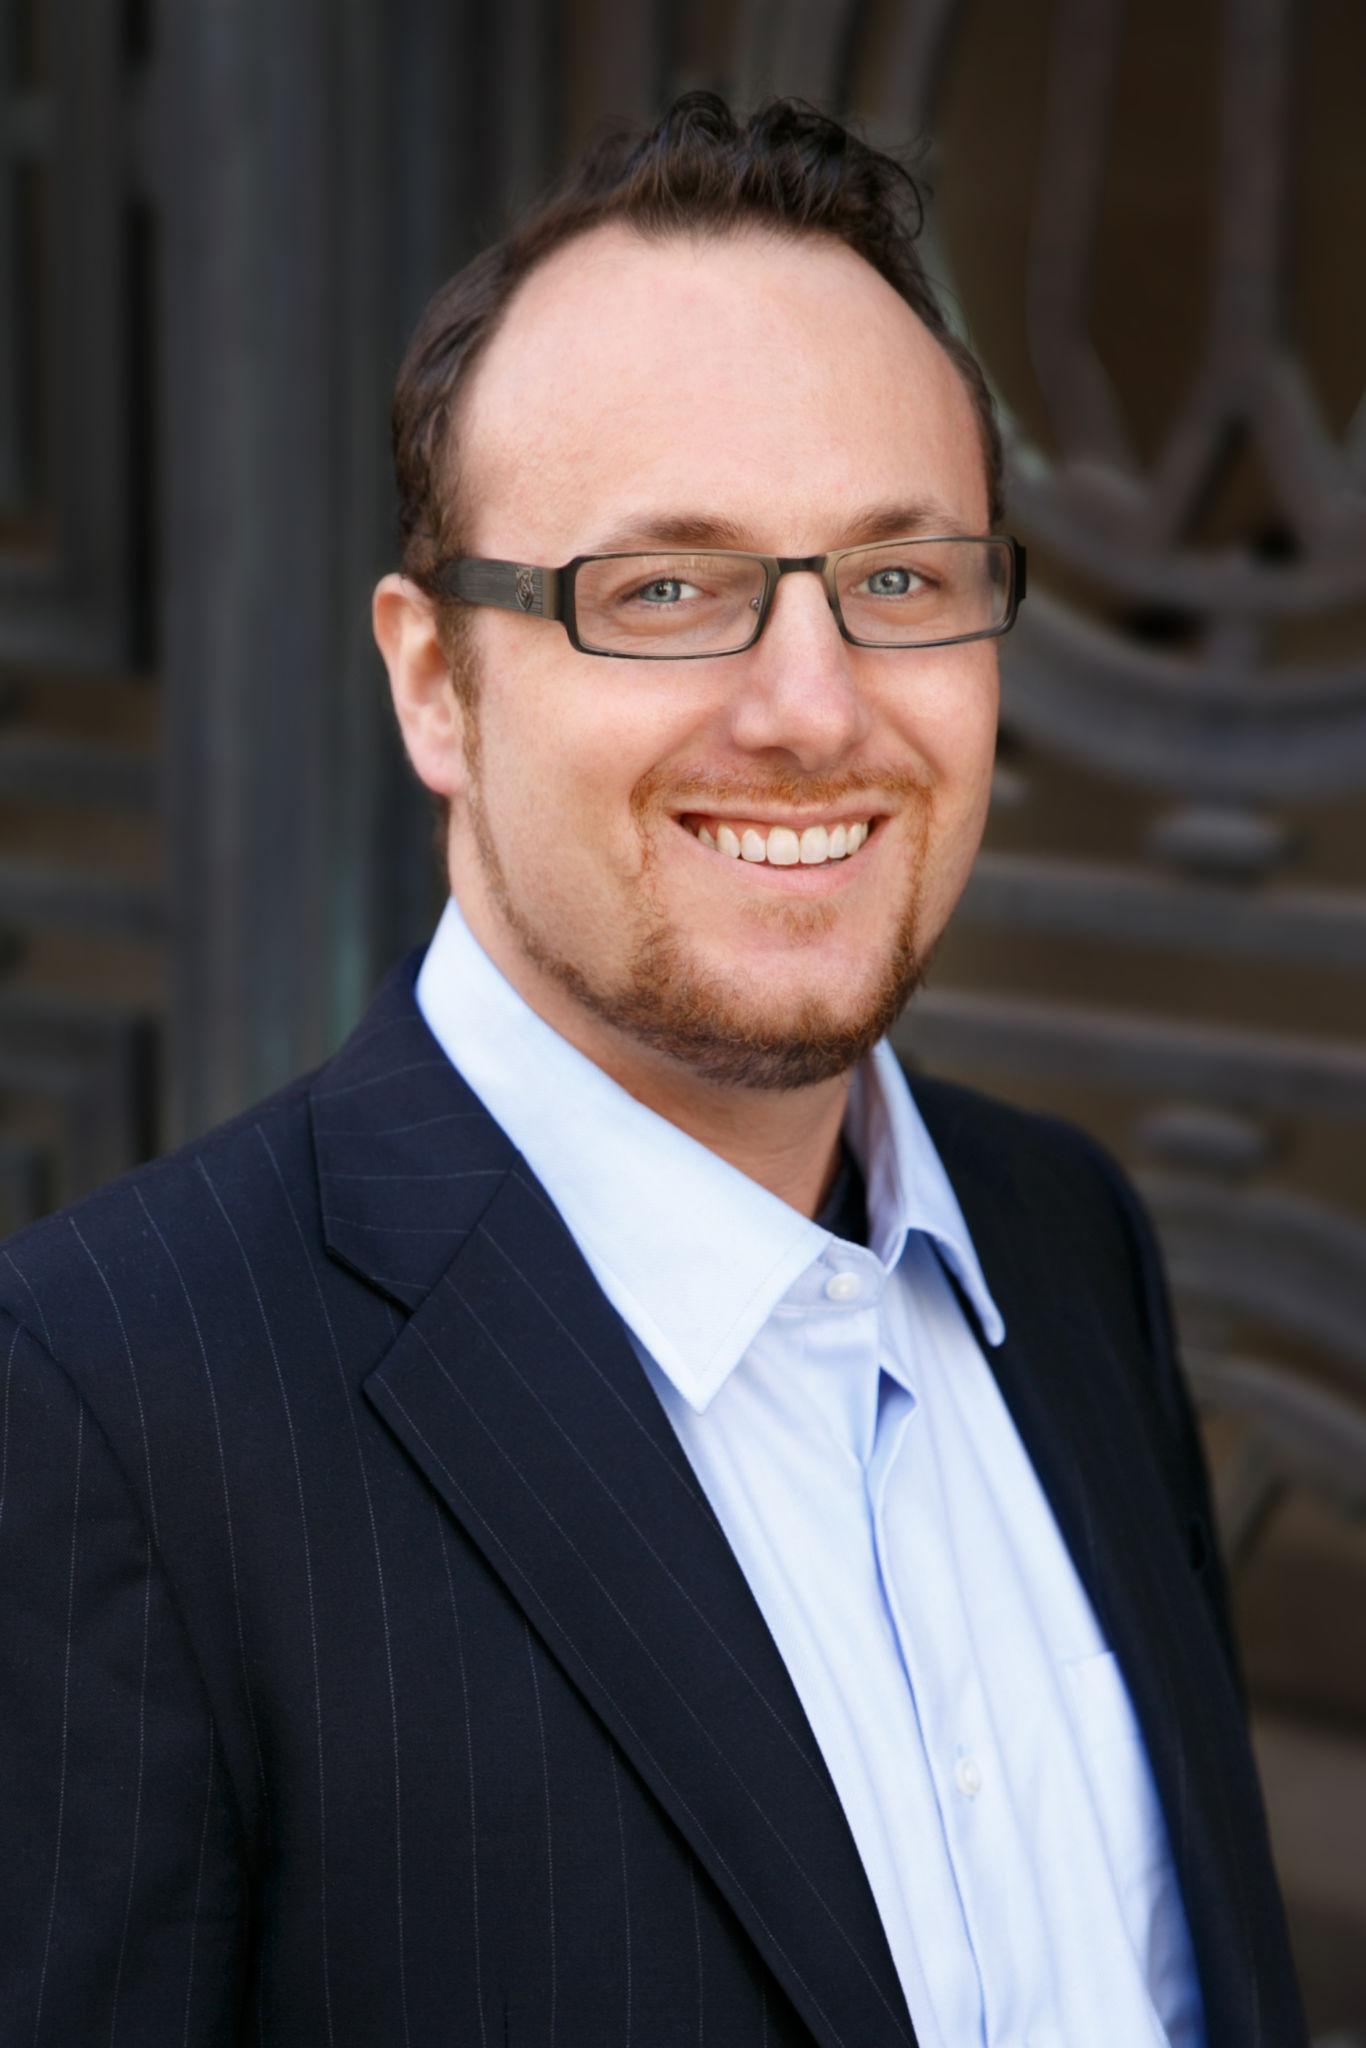 Aaron Blumenthal